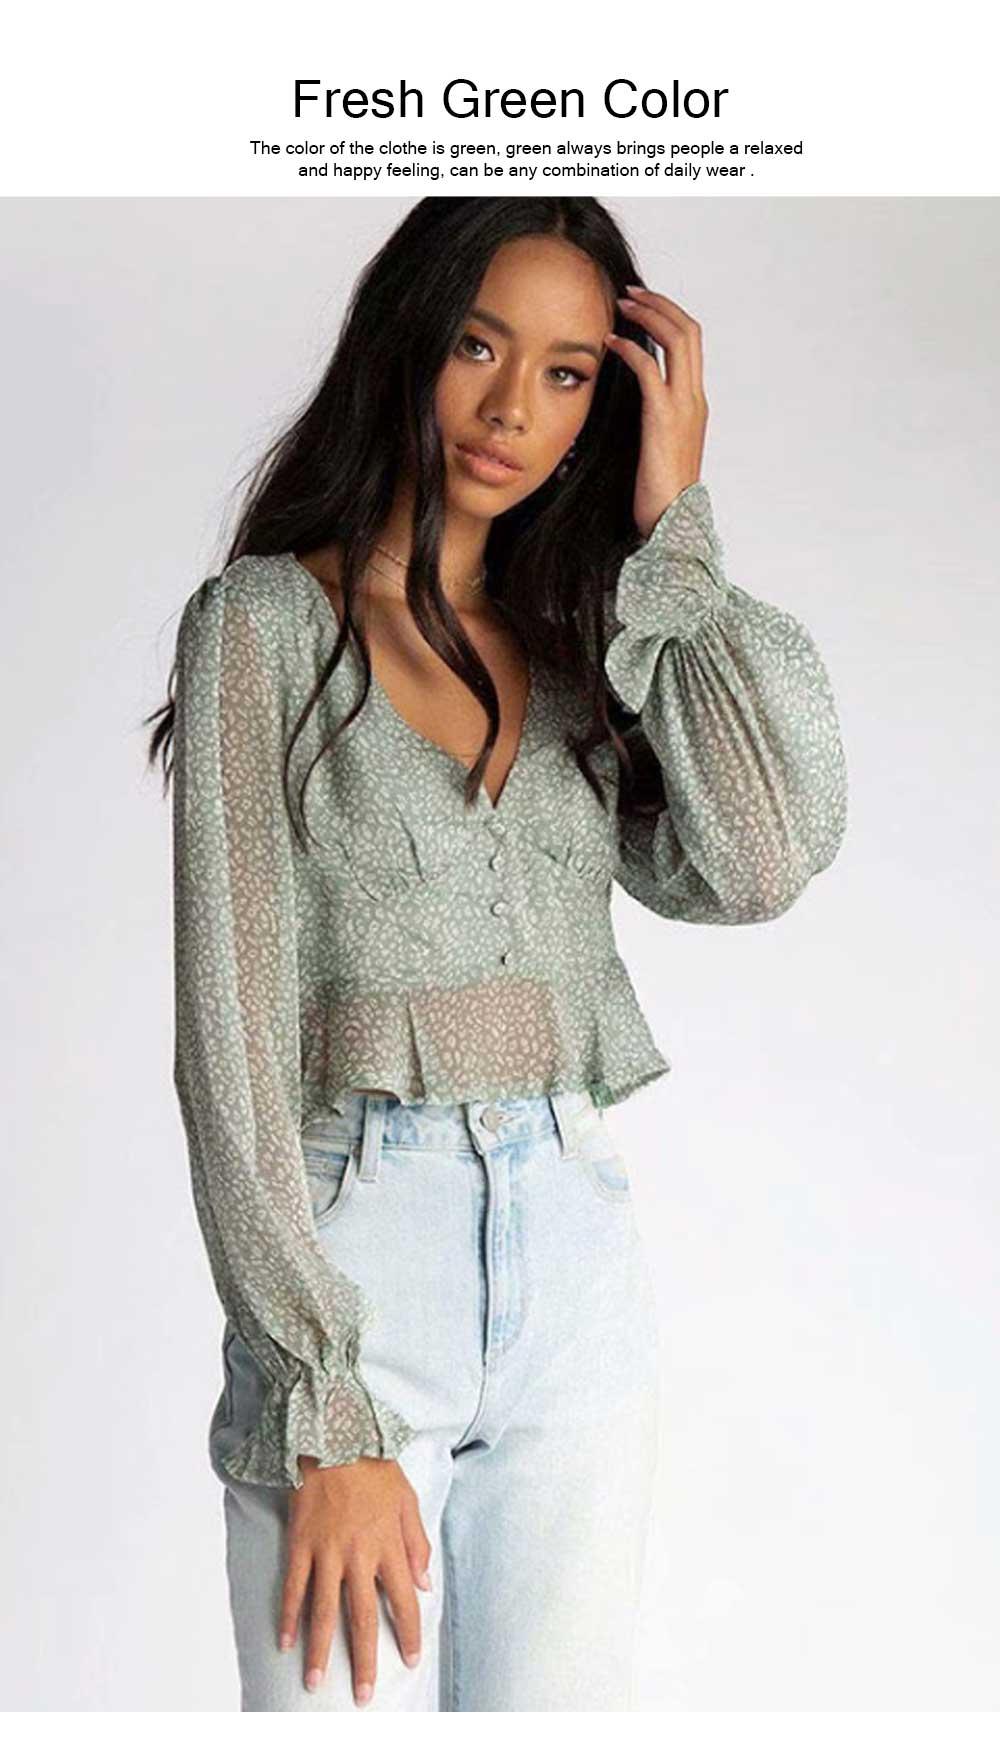 Lady Chiffon Shirt Deep-v Collar Flapper Tops Garment Design Long Sleeve Green Georgette Clothe for Women 5